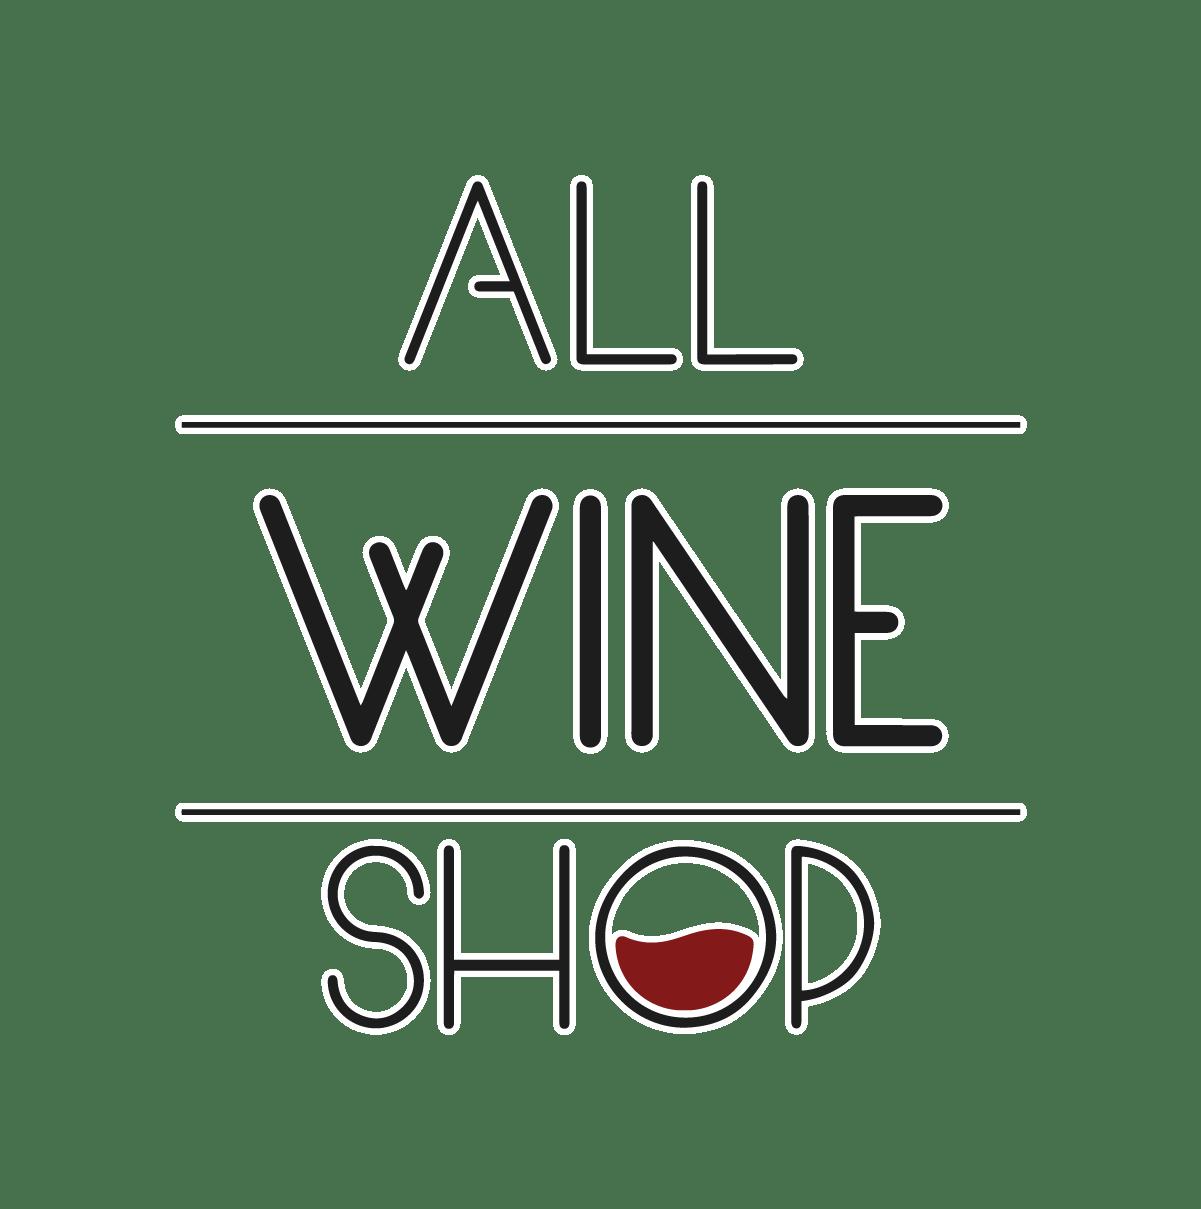 AllWineShop.eu